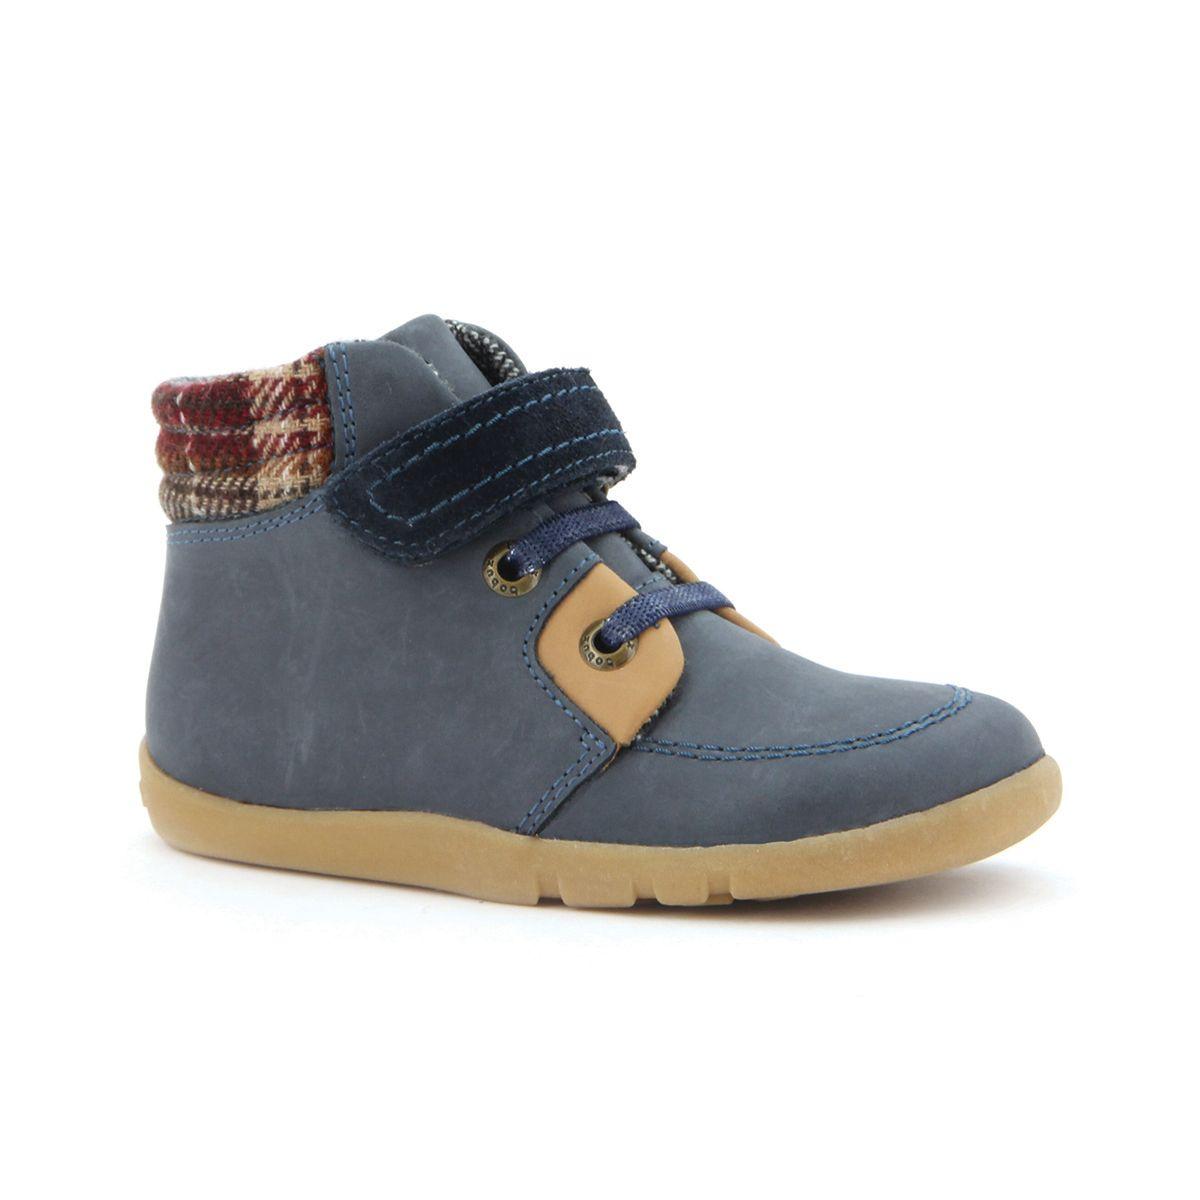 625301 Walk I Chaussures Deep Lumberjack Boot LMGzVqpSU